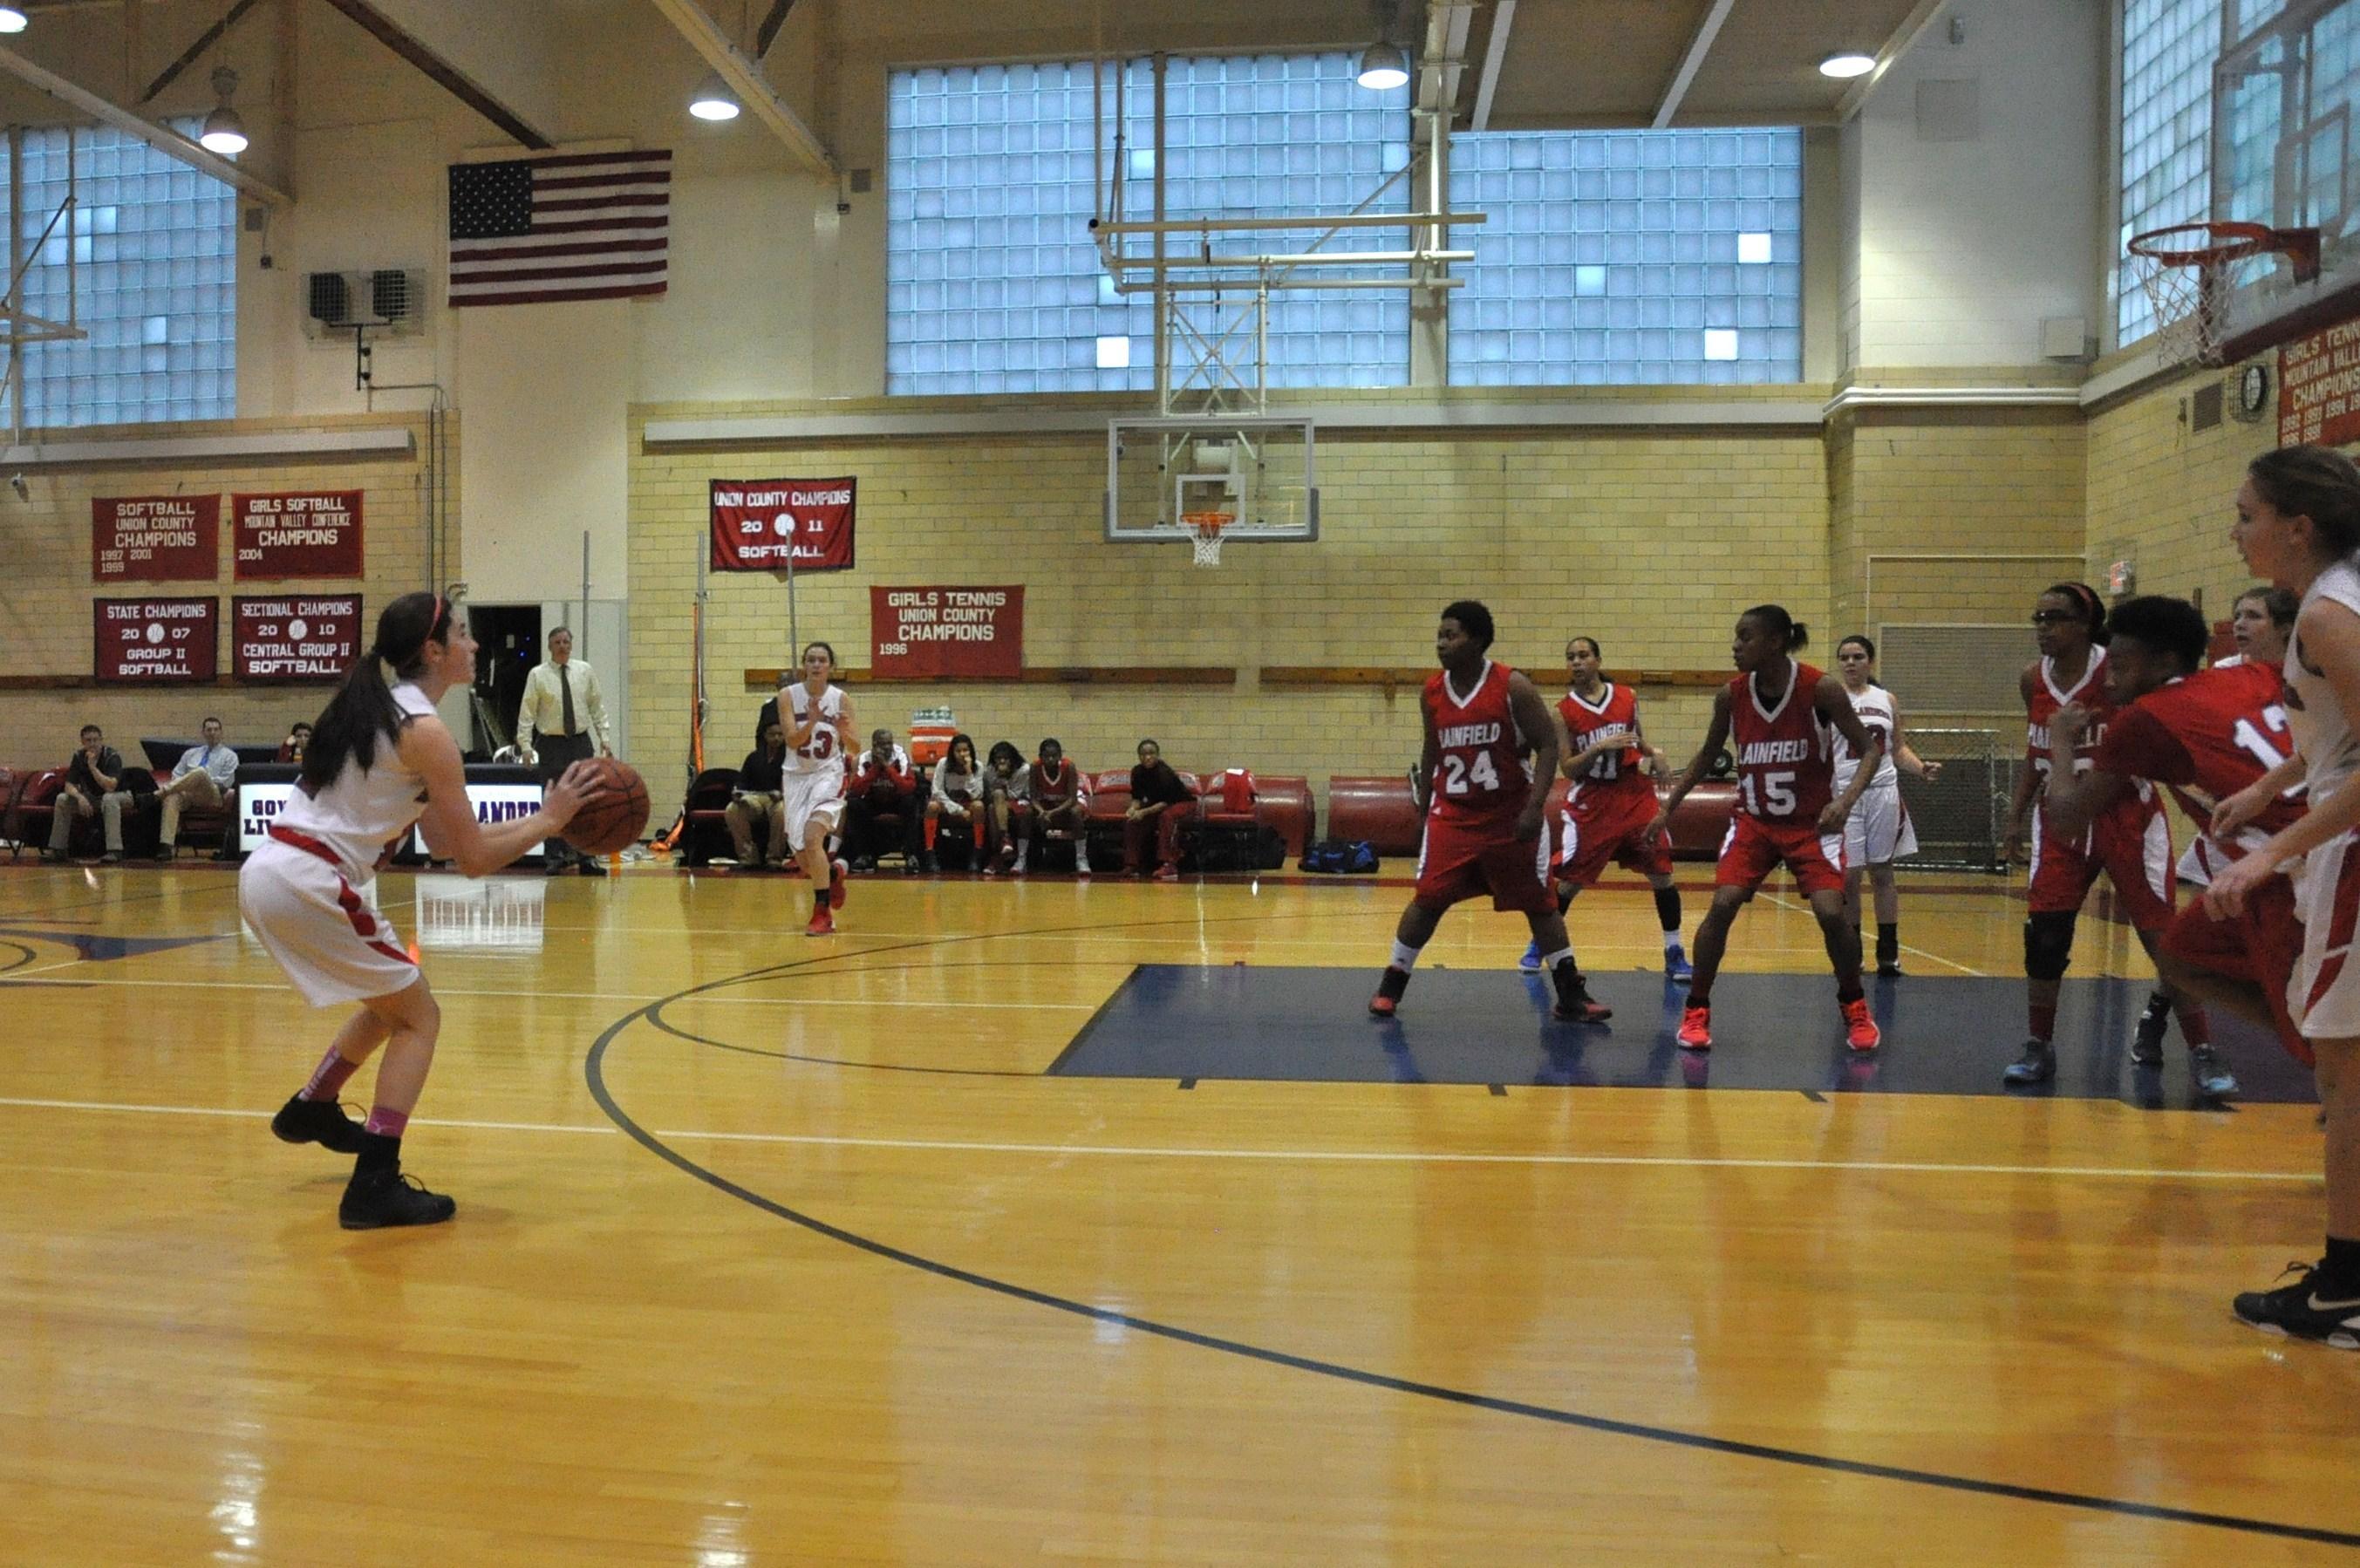 f9fa00e2ac156b5c24b6_girlsbasketballlaurenshot.jpg